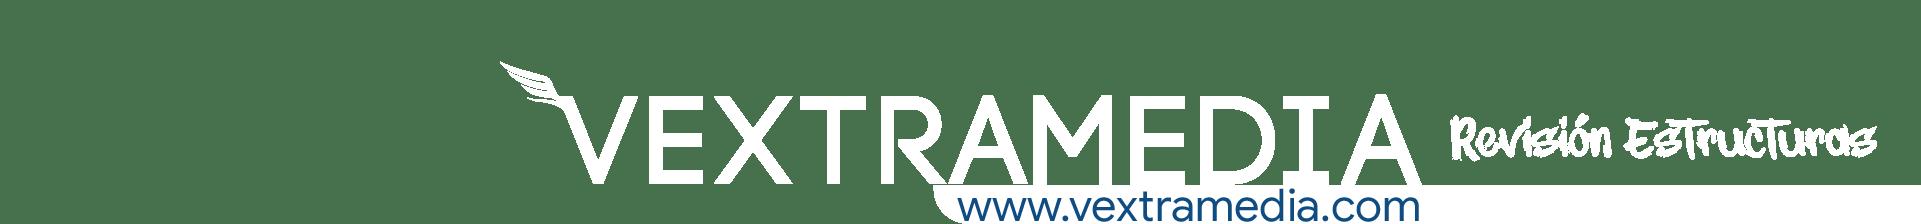 cabecera-revision-de-estructuras-vextramedia-